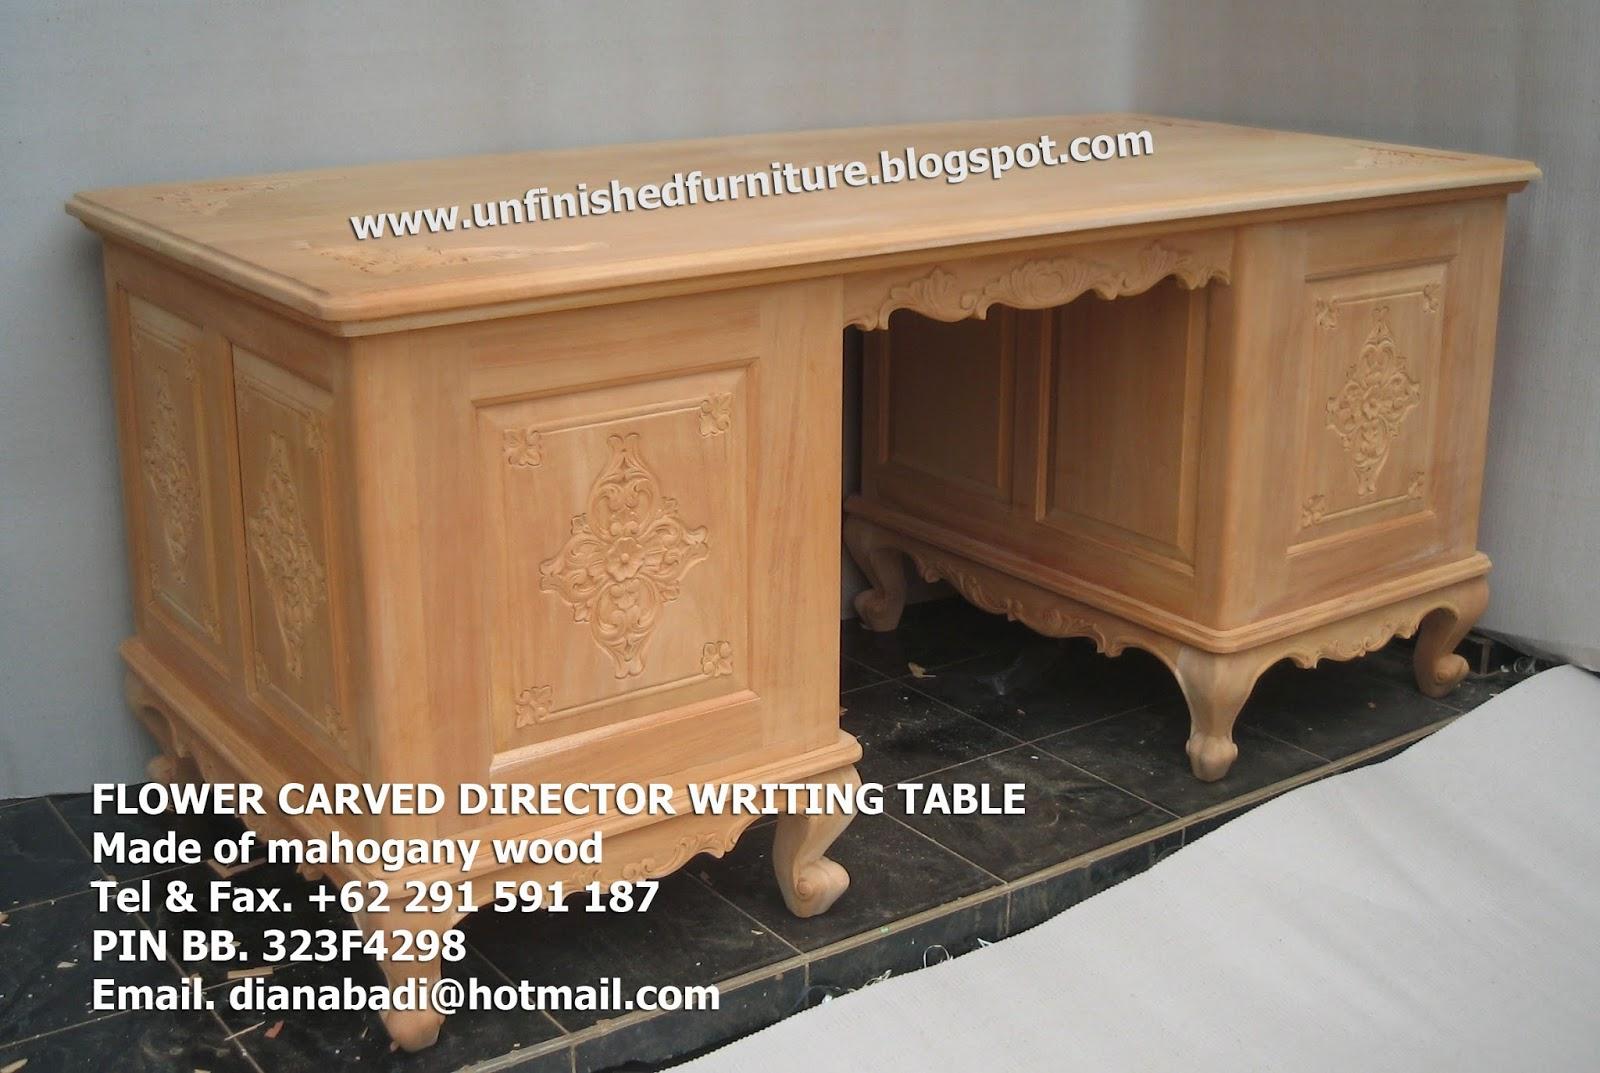 Mebel Klasik furniture klasik, meja tulis director, meja tulis mewah director, meja tulis ukir klasik director, meja tulis solid director, meja tulis director partner desk